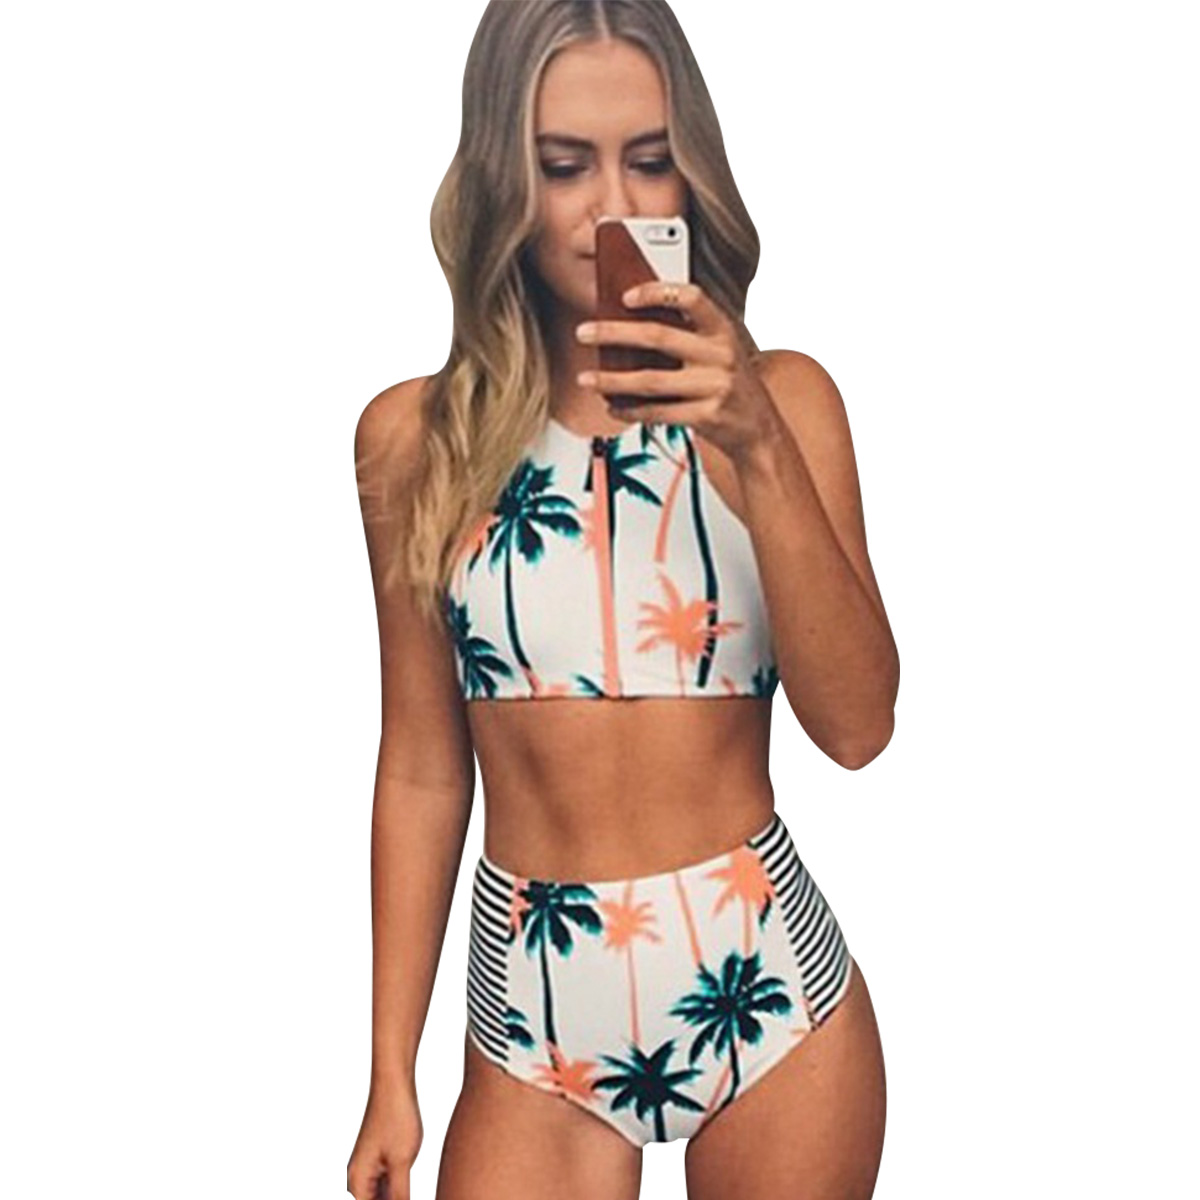 Women Cute Padded High Neck Coconut Tree Print Bikini Sets Cute Bathing Suit e0e426bdd